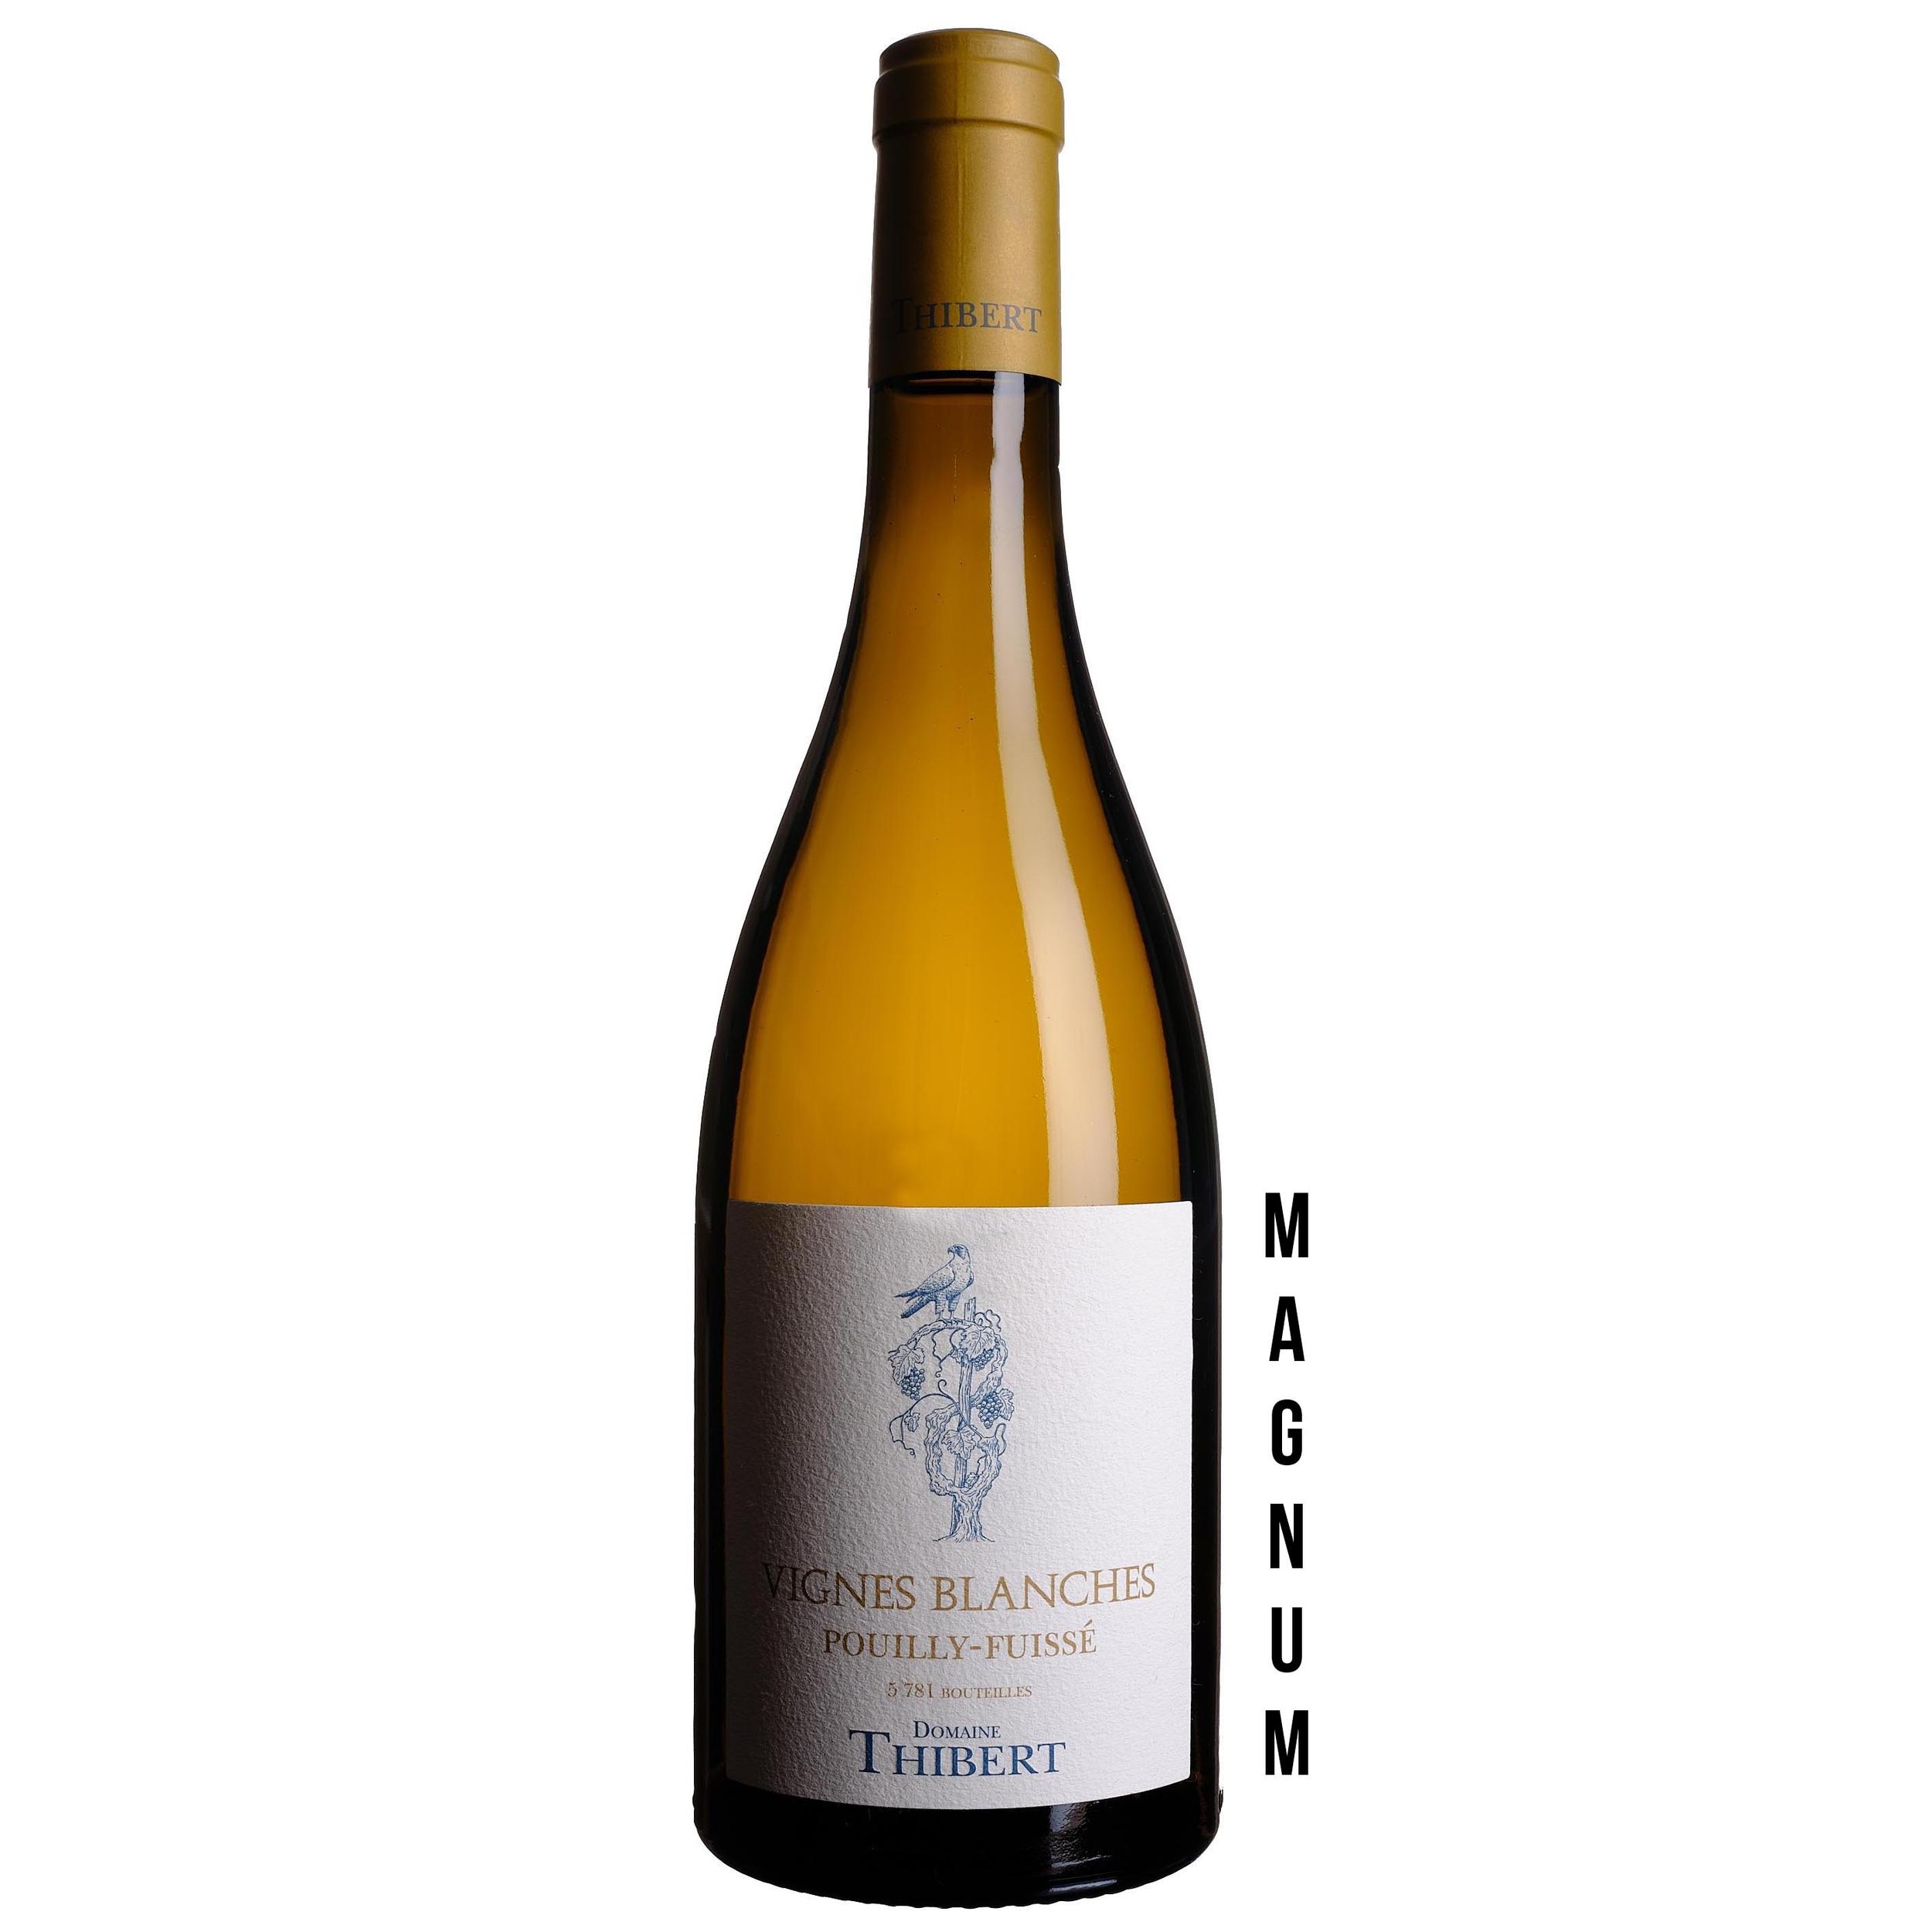 Pouilly Fuisse - Vignes Blanches - Domaine Thibert - 2010 - Magnum